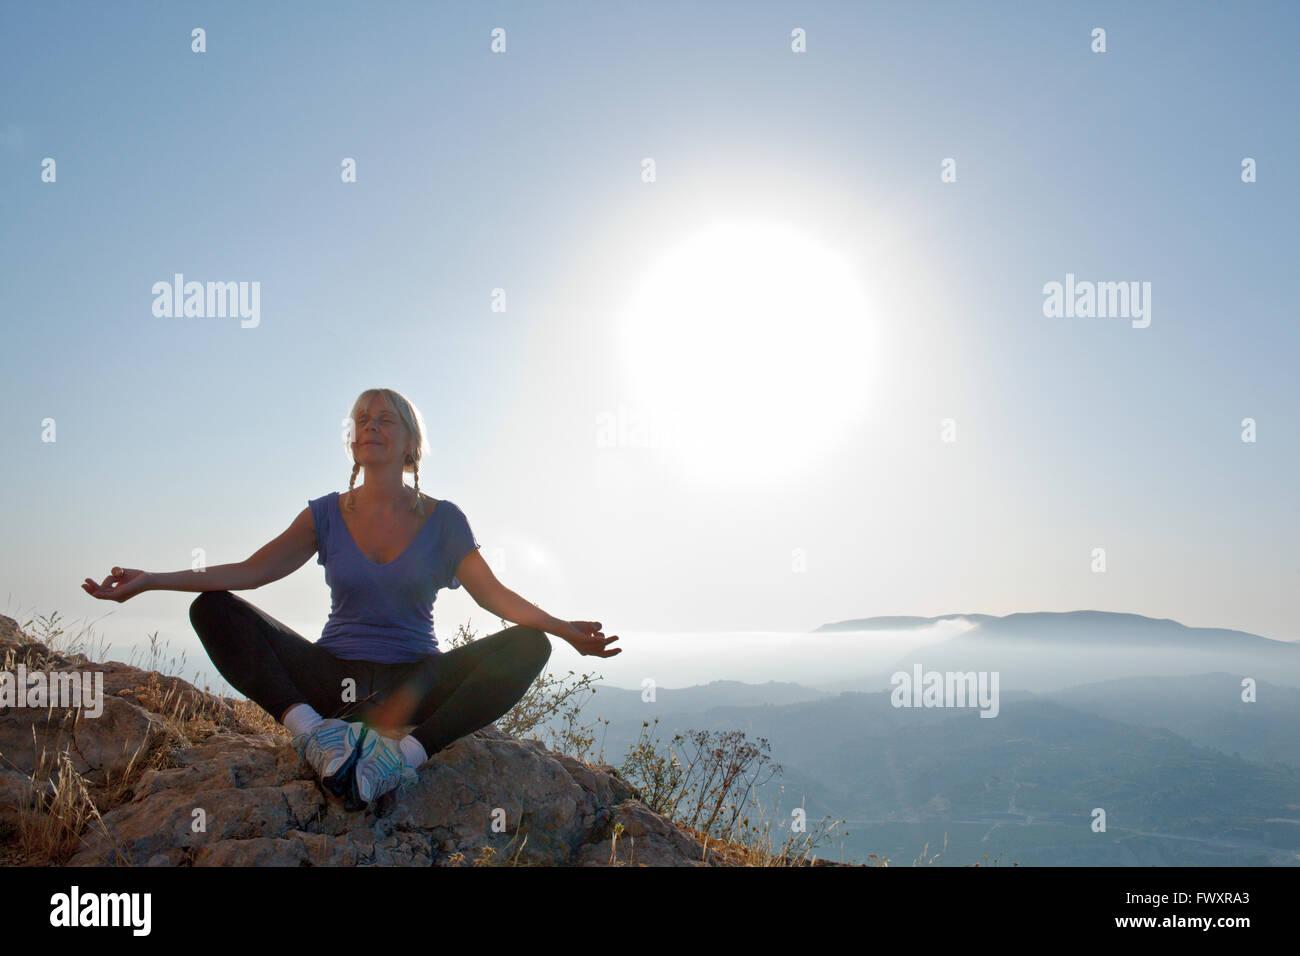 L'Espagne, Alicante, Cocentaina, mature woman sitting cross-legged on rocks et méditant Photo Stock